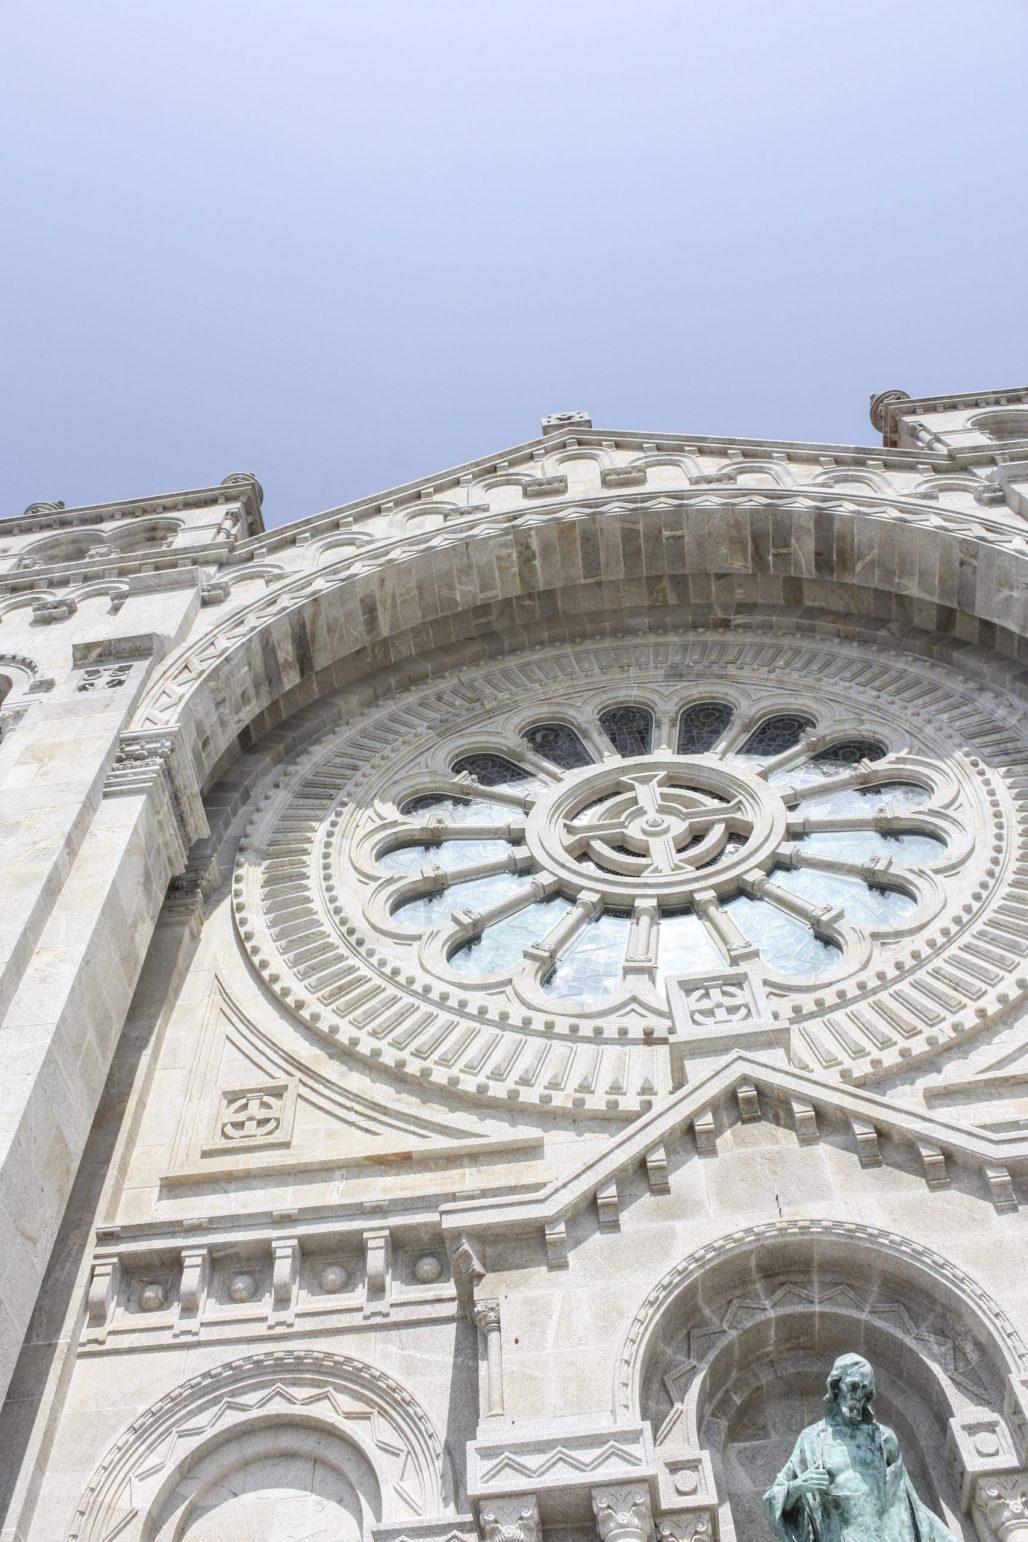 Traveling to ..... Santuário de Santa Luzia :: Viana do Castelo & the Quest for the Meaning of Flower Window Designs || Dreamery Travels